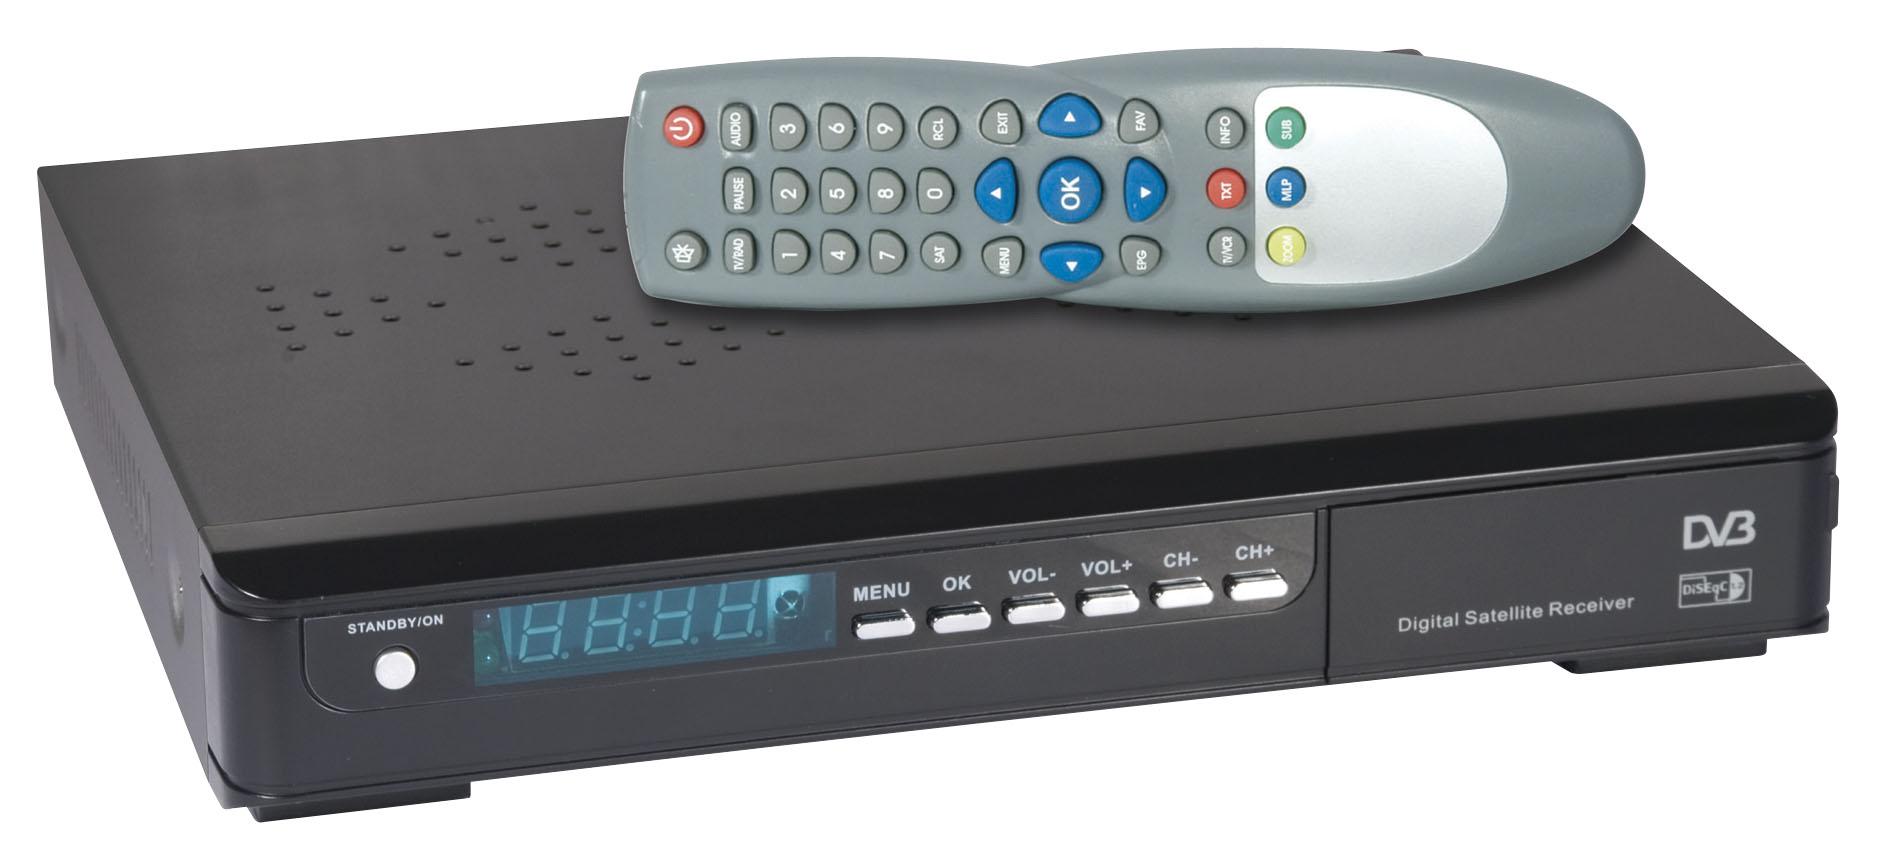 digital satellite receiver free to air